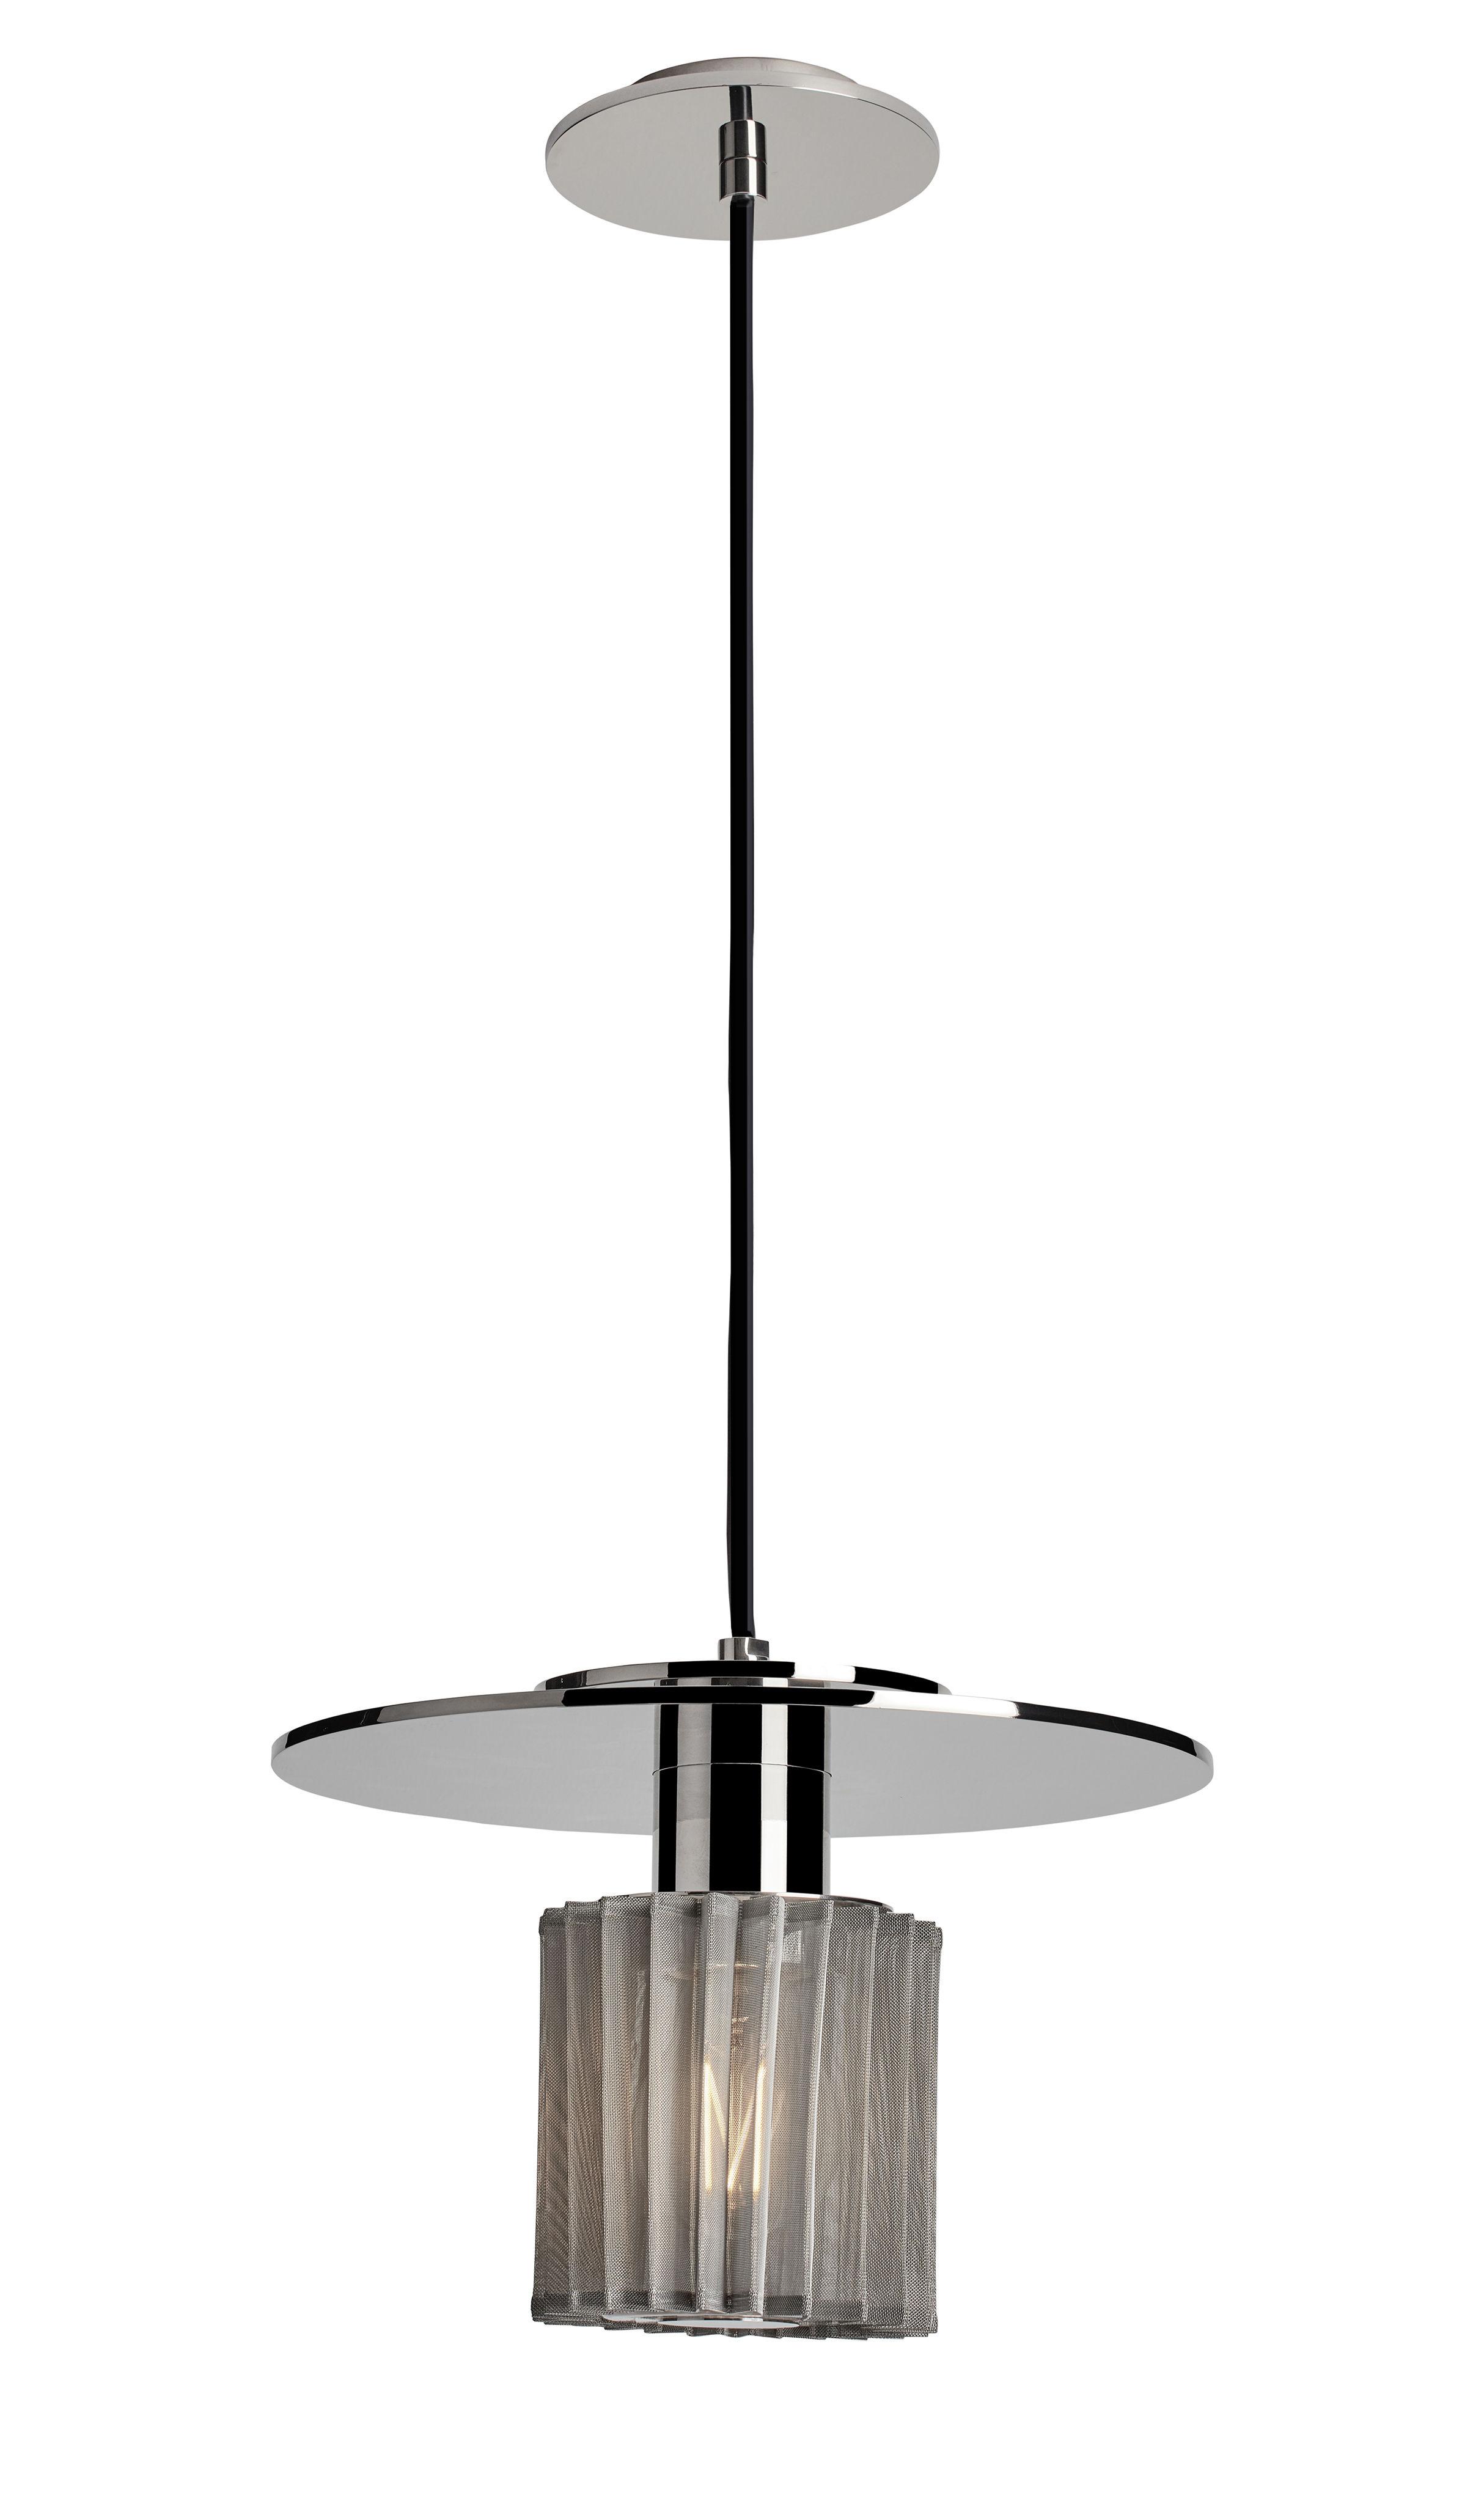 Lighting - Pendant Lighting - In the sun Medium Pendant - / Ø 27 cm by DCW éditions - Chrome / Silver mesh - Aluminium, Glass, Steel